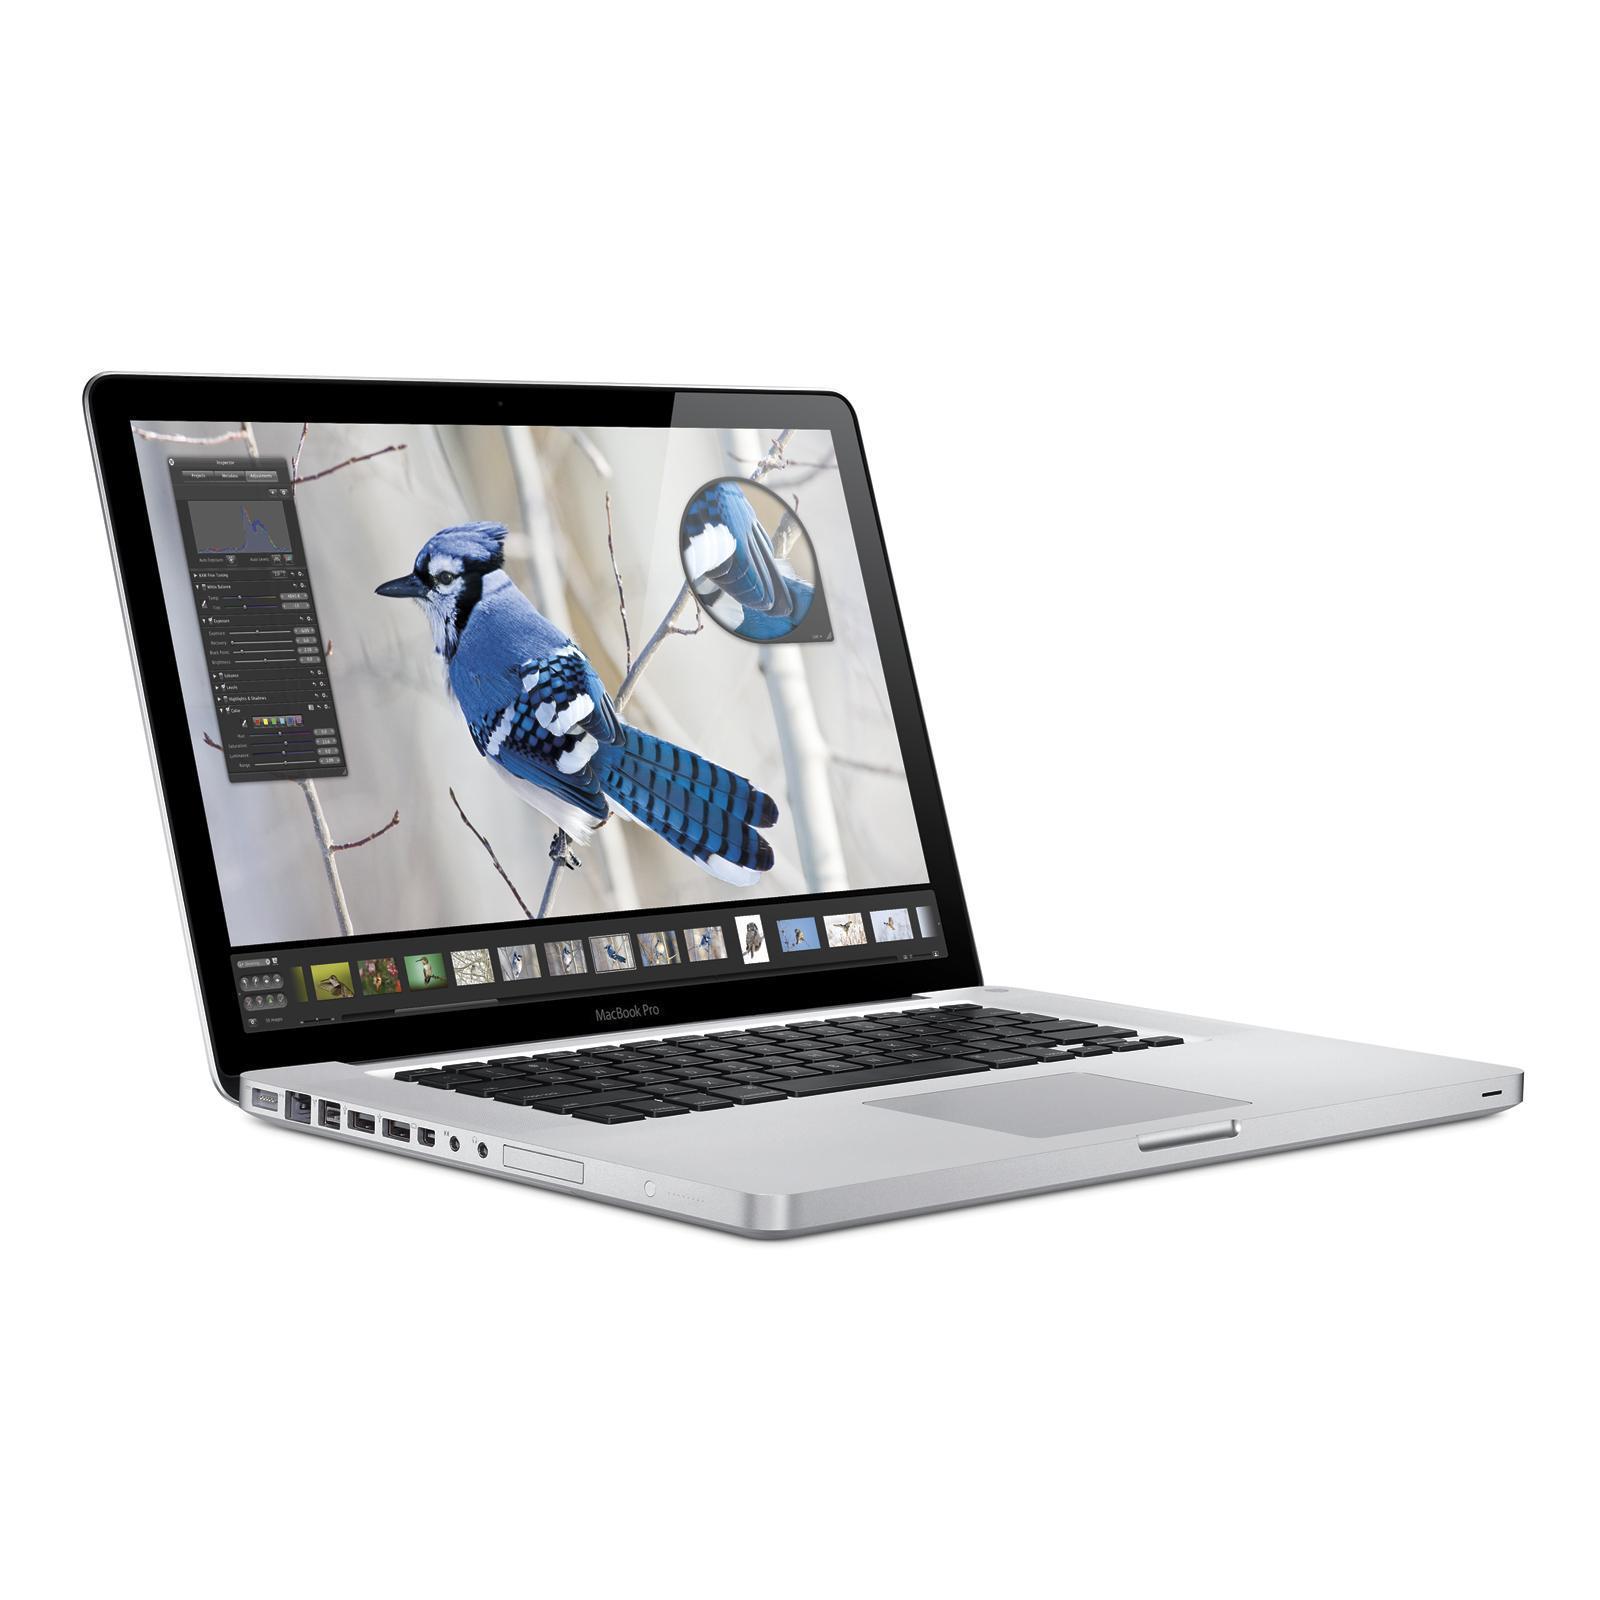 "MacBook Pro ""Core 2 Duo"" 2.4 15"" Fin 2008"